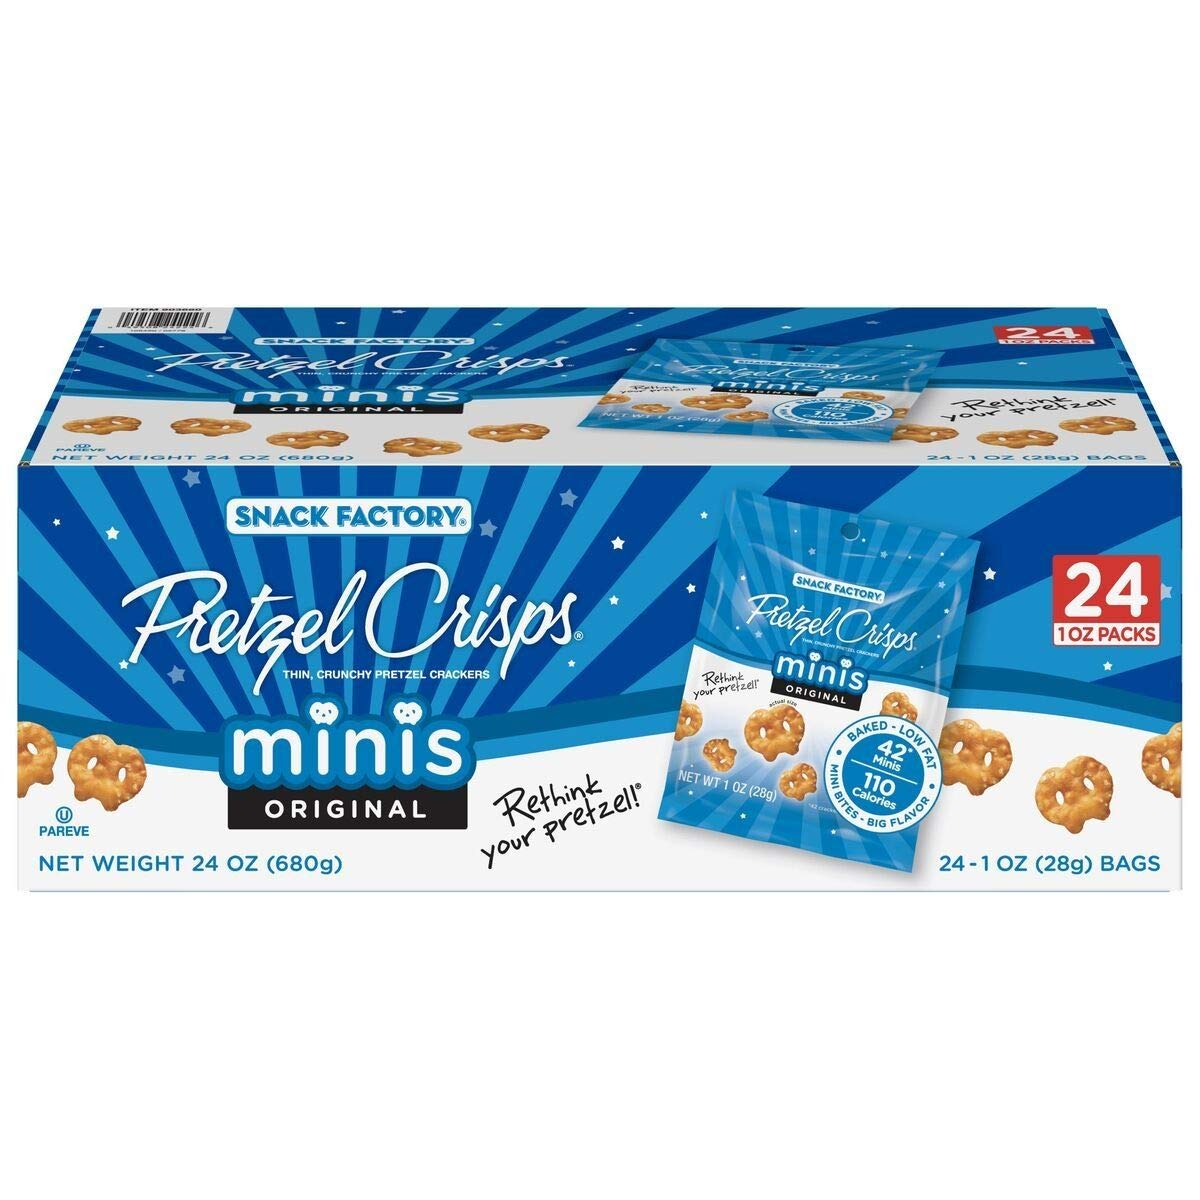 Snack Factory Pretzel Crisps Original Minis, Single-Serve 1 Oz, 24 Ct by Snack Factory